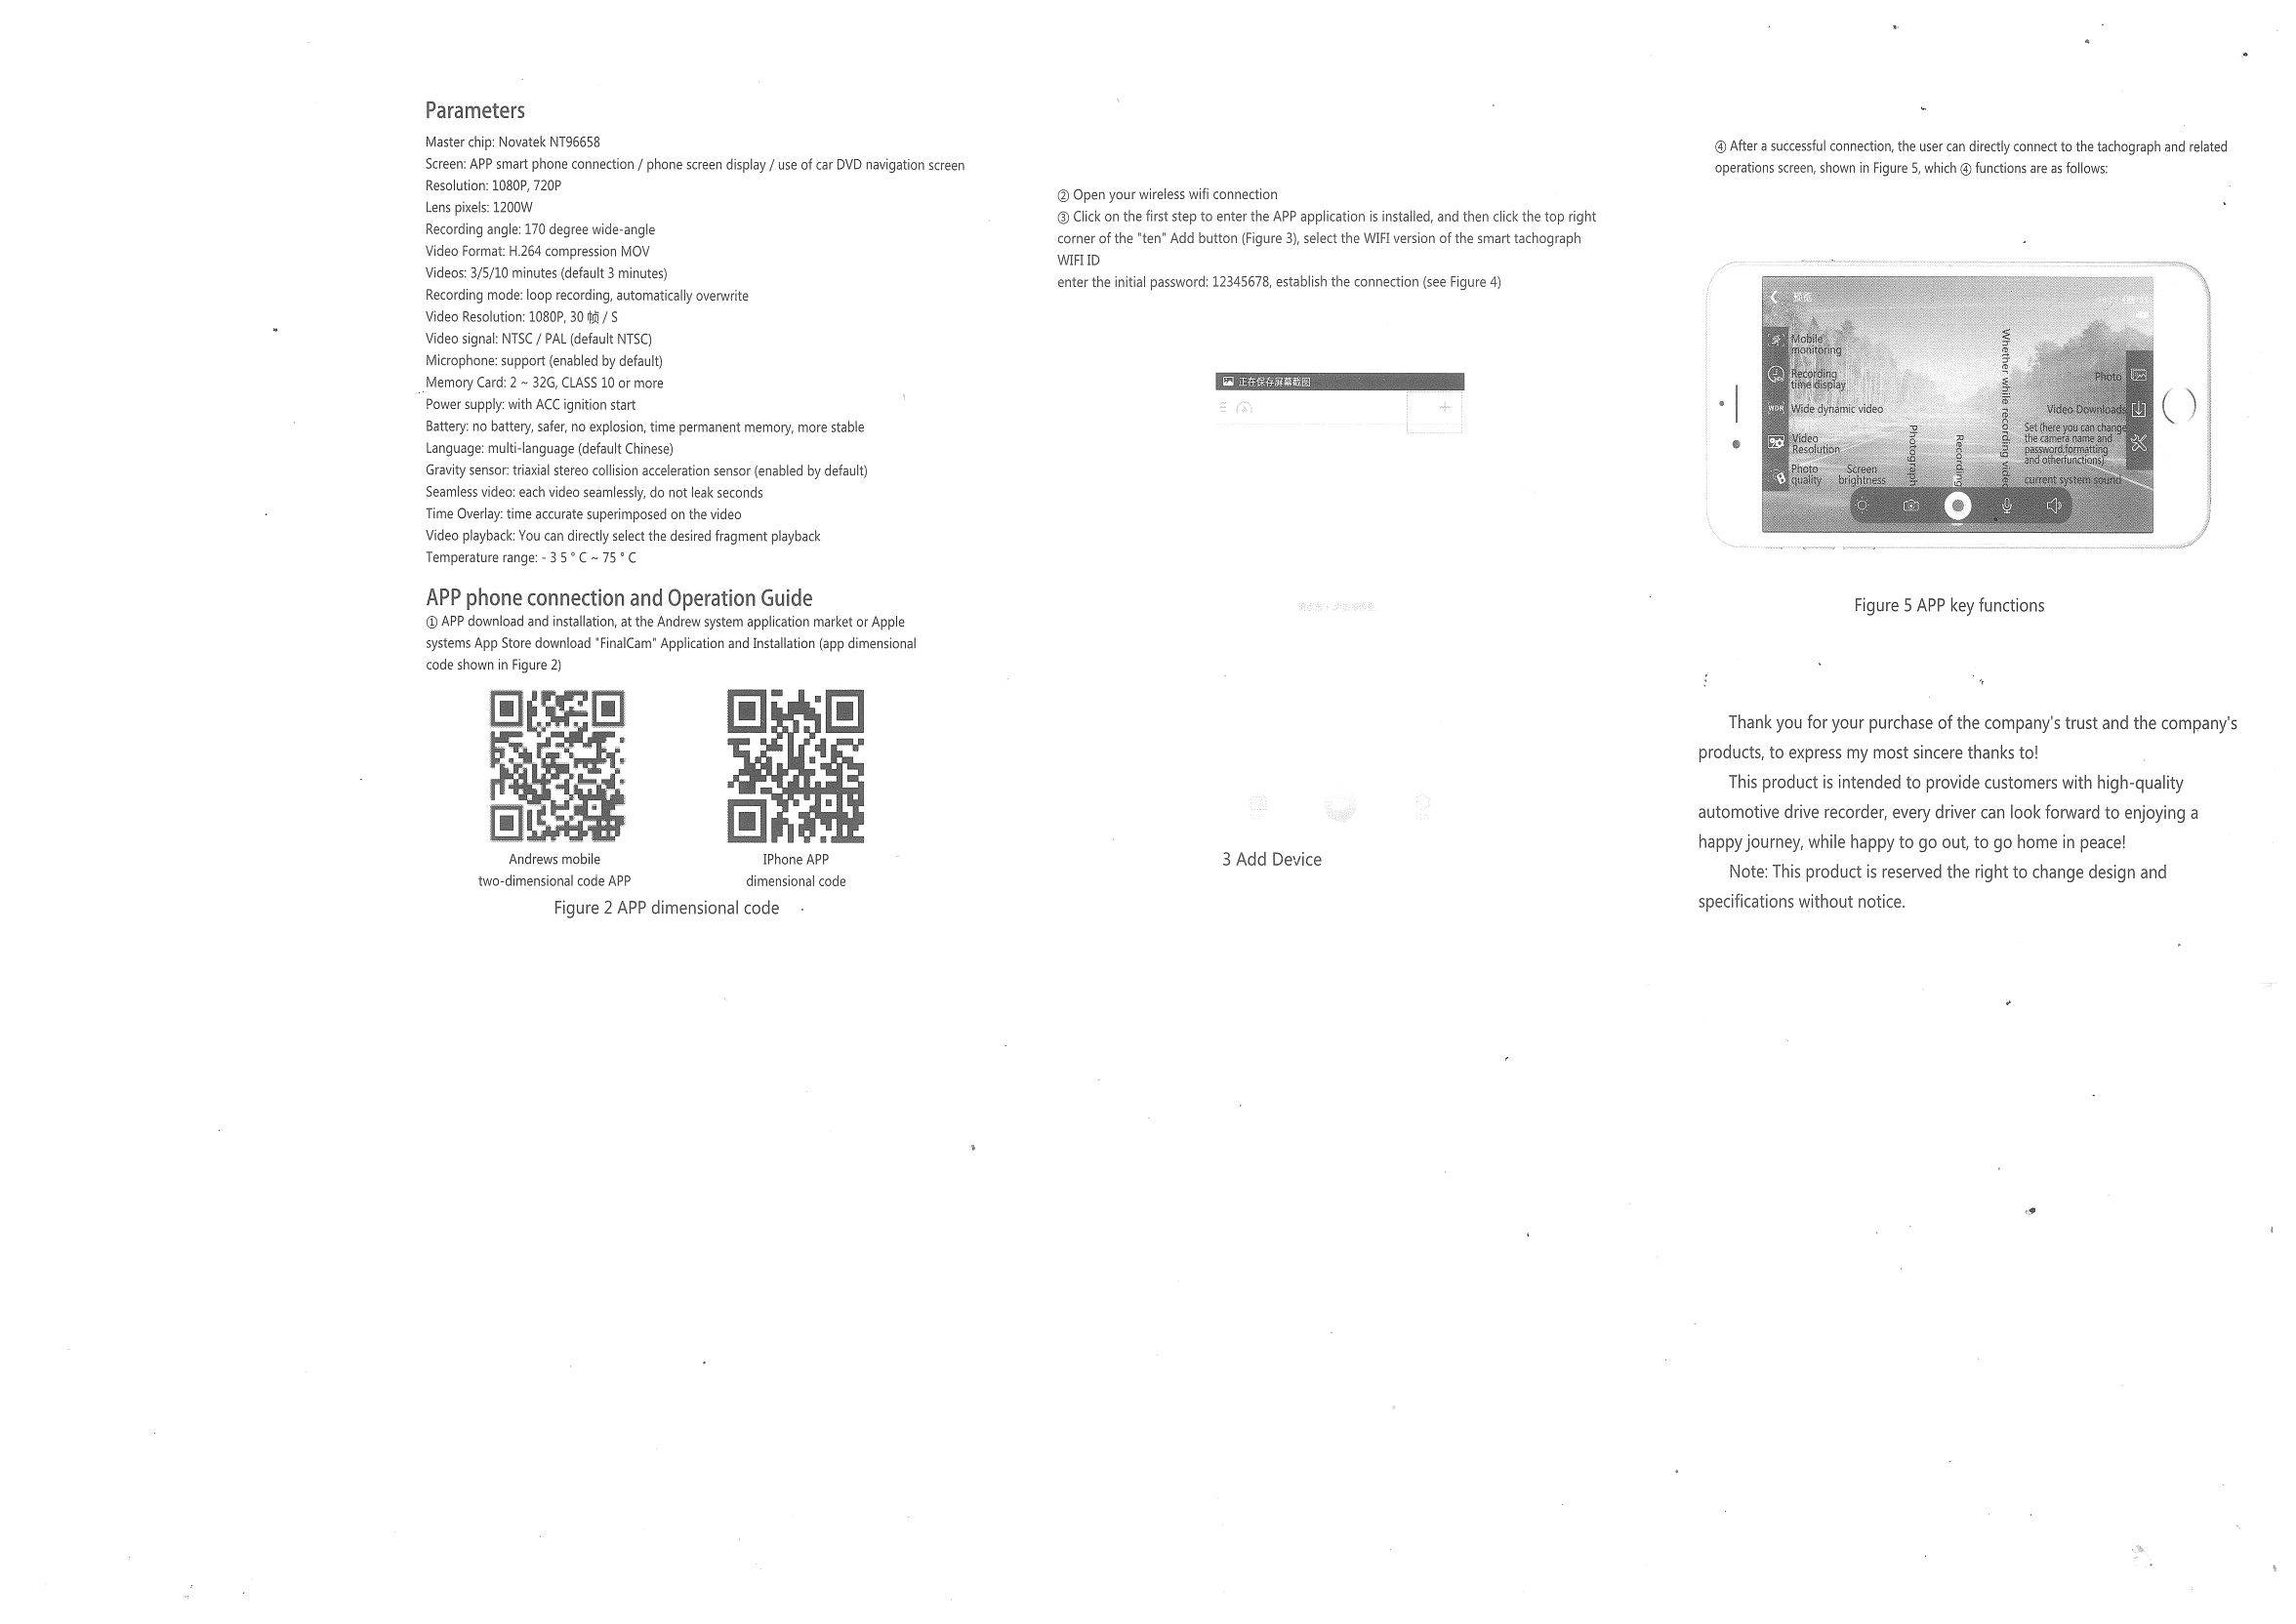 File Management Mdisk Kabel Data Ampamp Charger Usb Micro Steel Mesh G322 Https Chinavasioncom China Wholesale Car Video Dvr Dash Cam And Reverse Camera Cvaiy C564 Manual 1